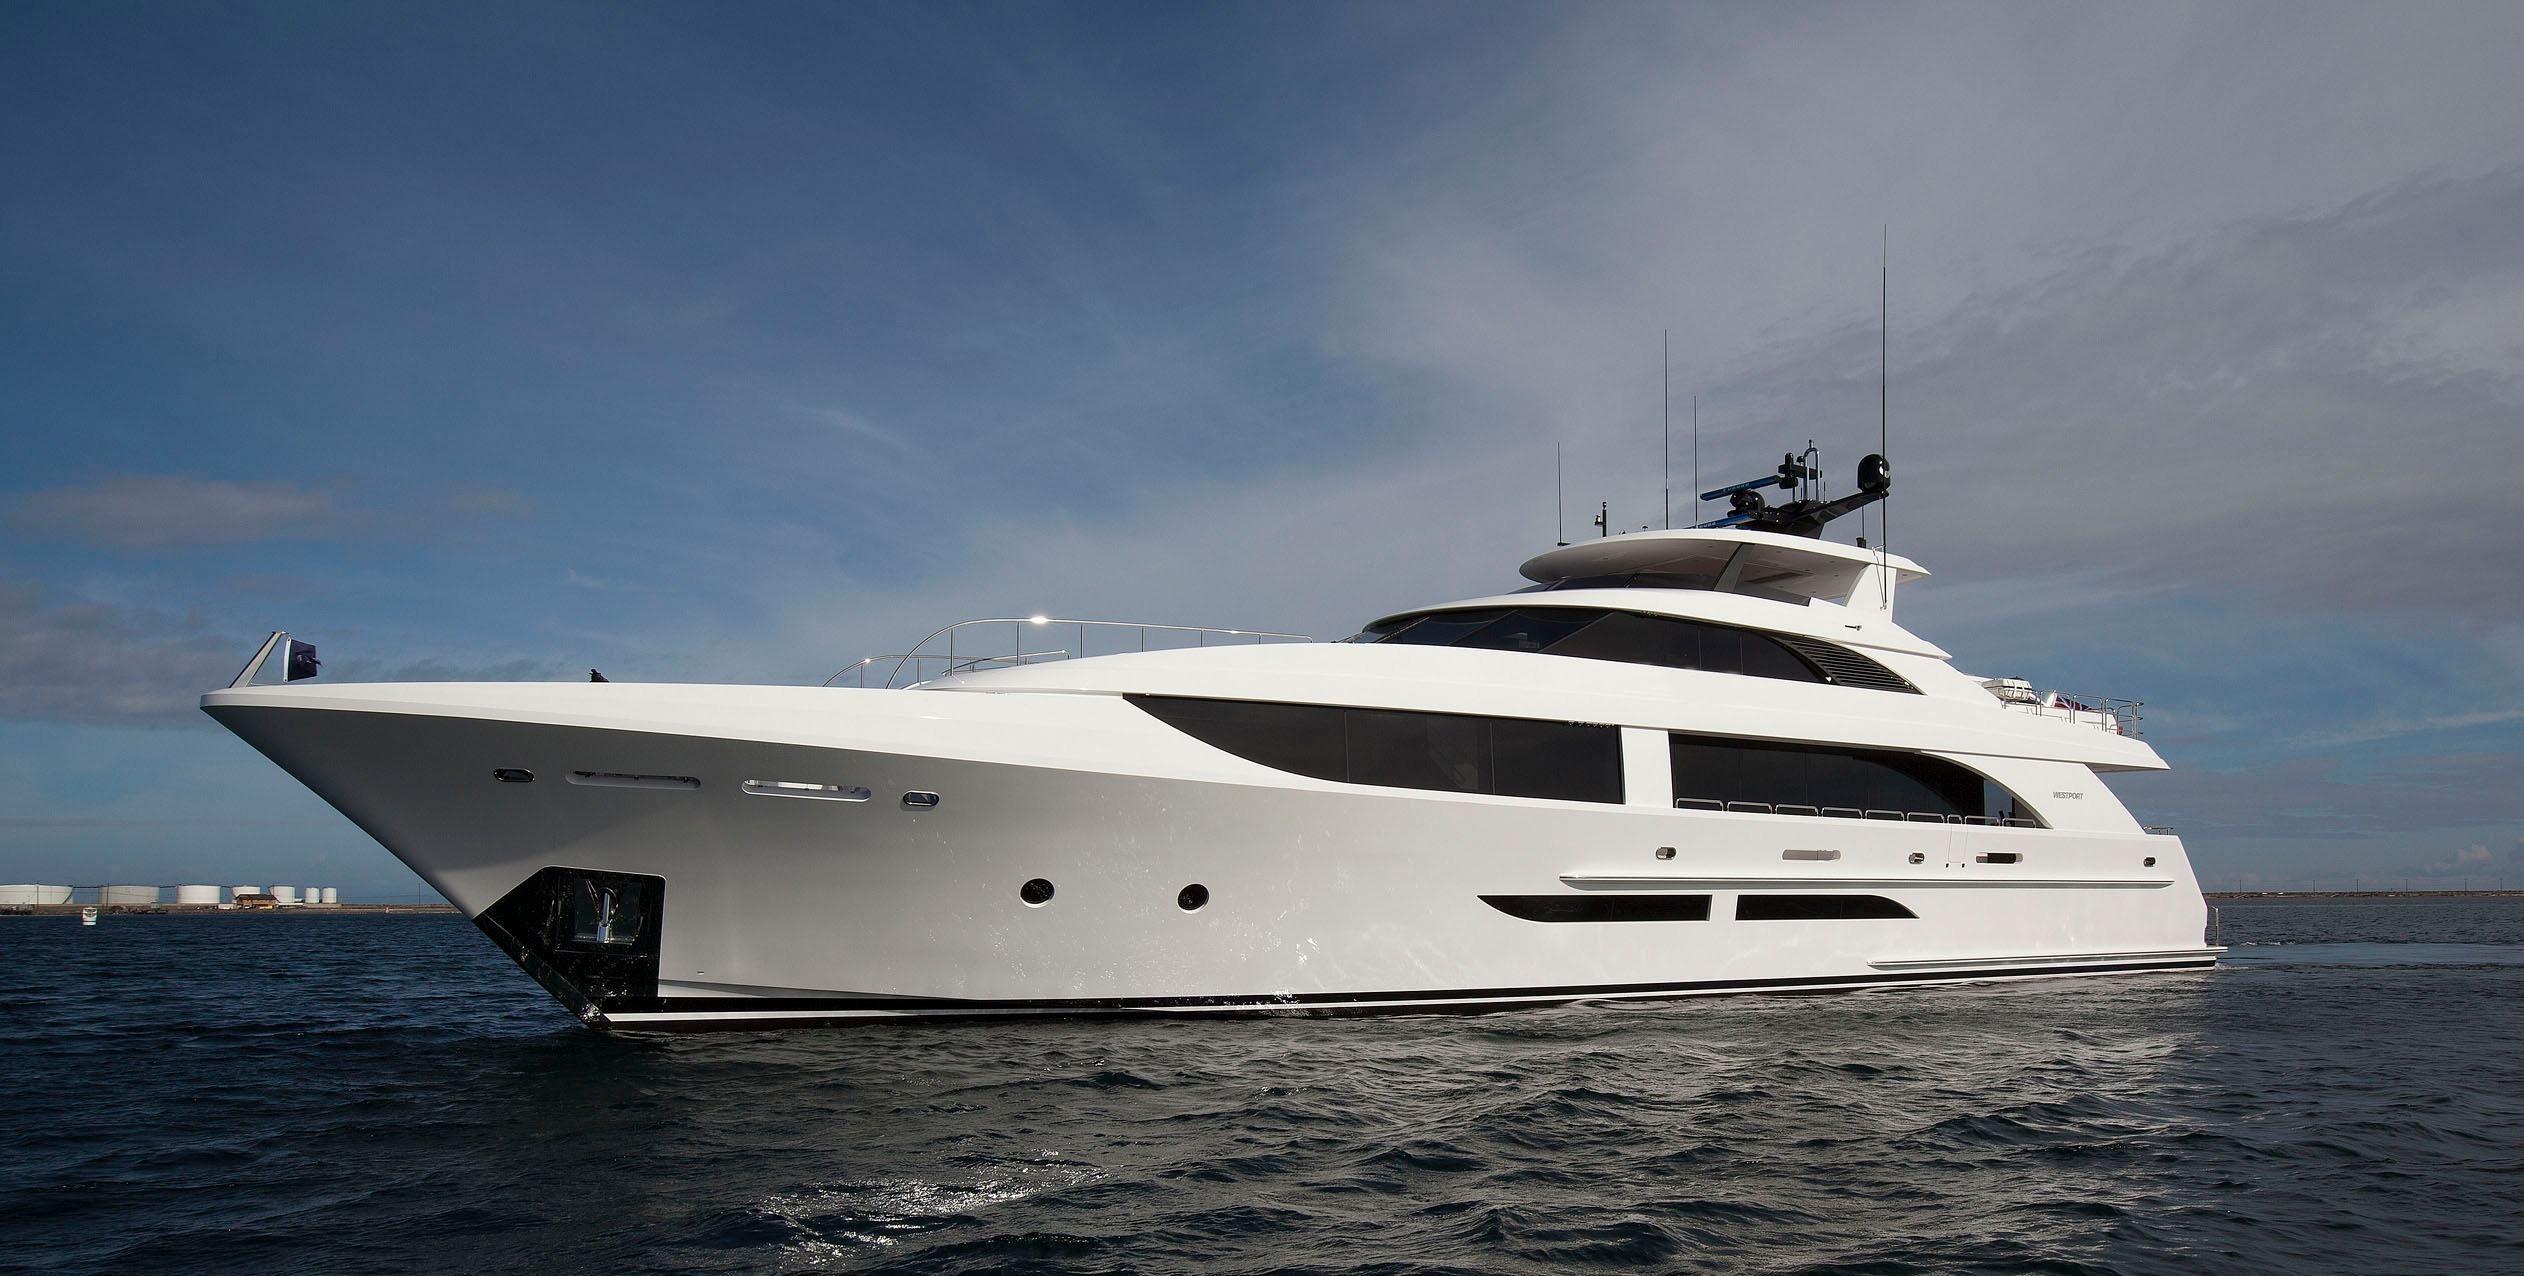 2018 westport 125 39 38 meter power boat for sale www for The westport